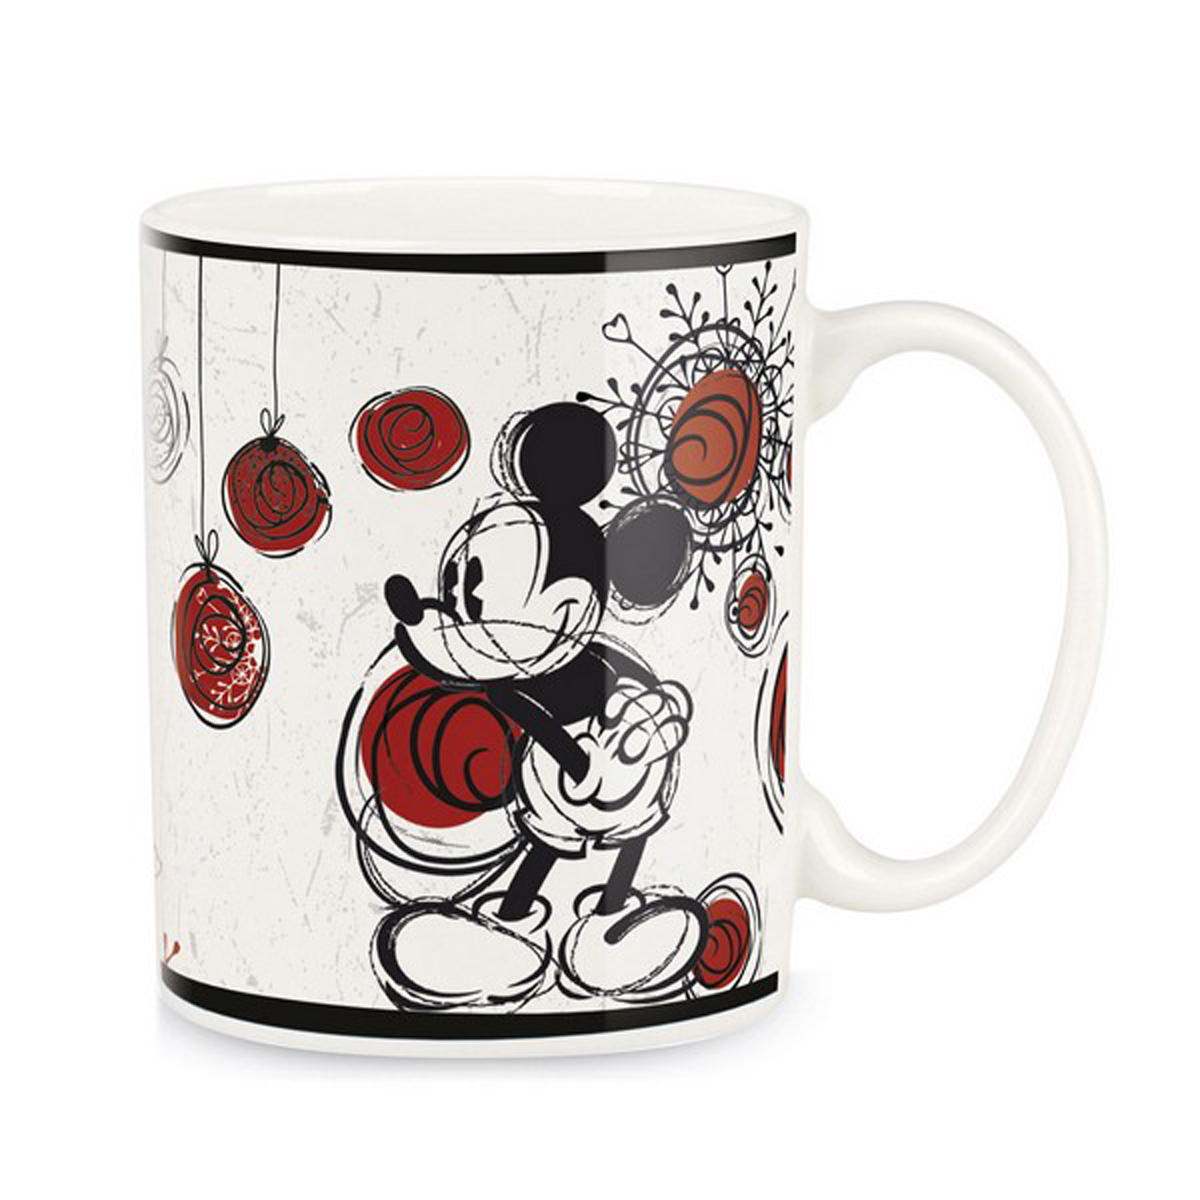 Mug céramique \'Mickey\' (Mickey Mouse) blanc rouge - 90x85 mm (330 ml) - [A1479]